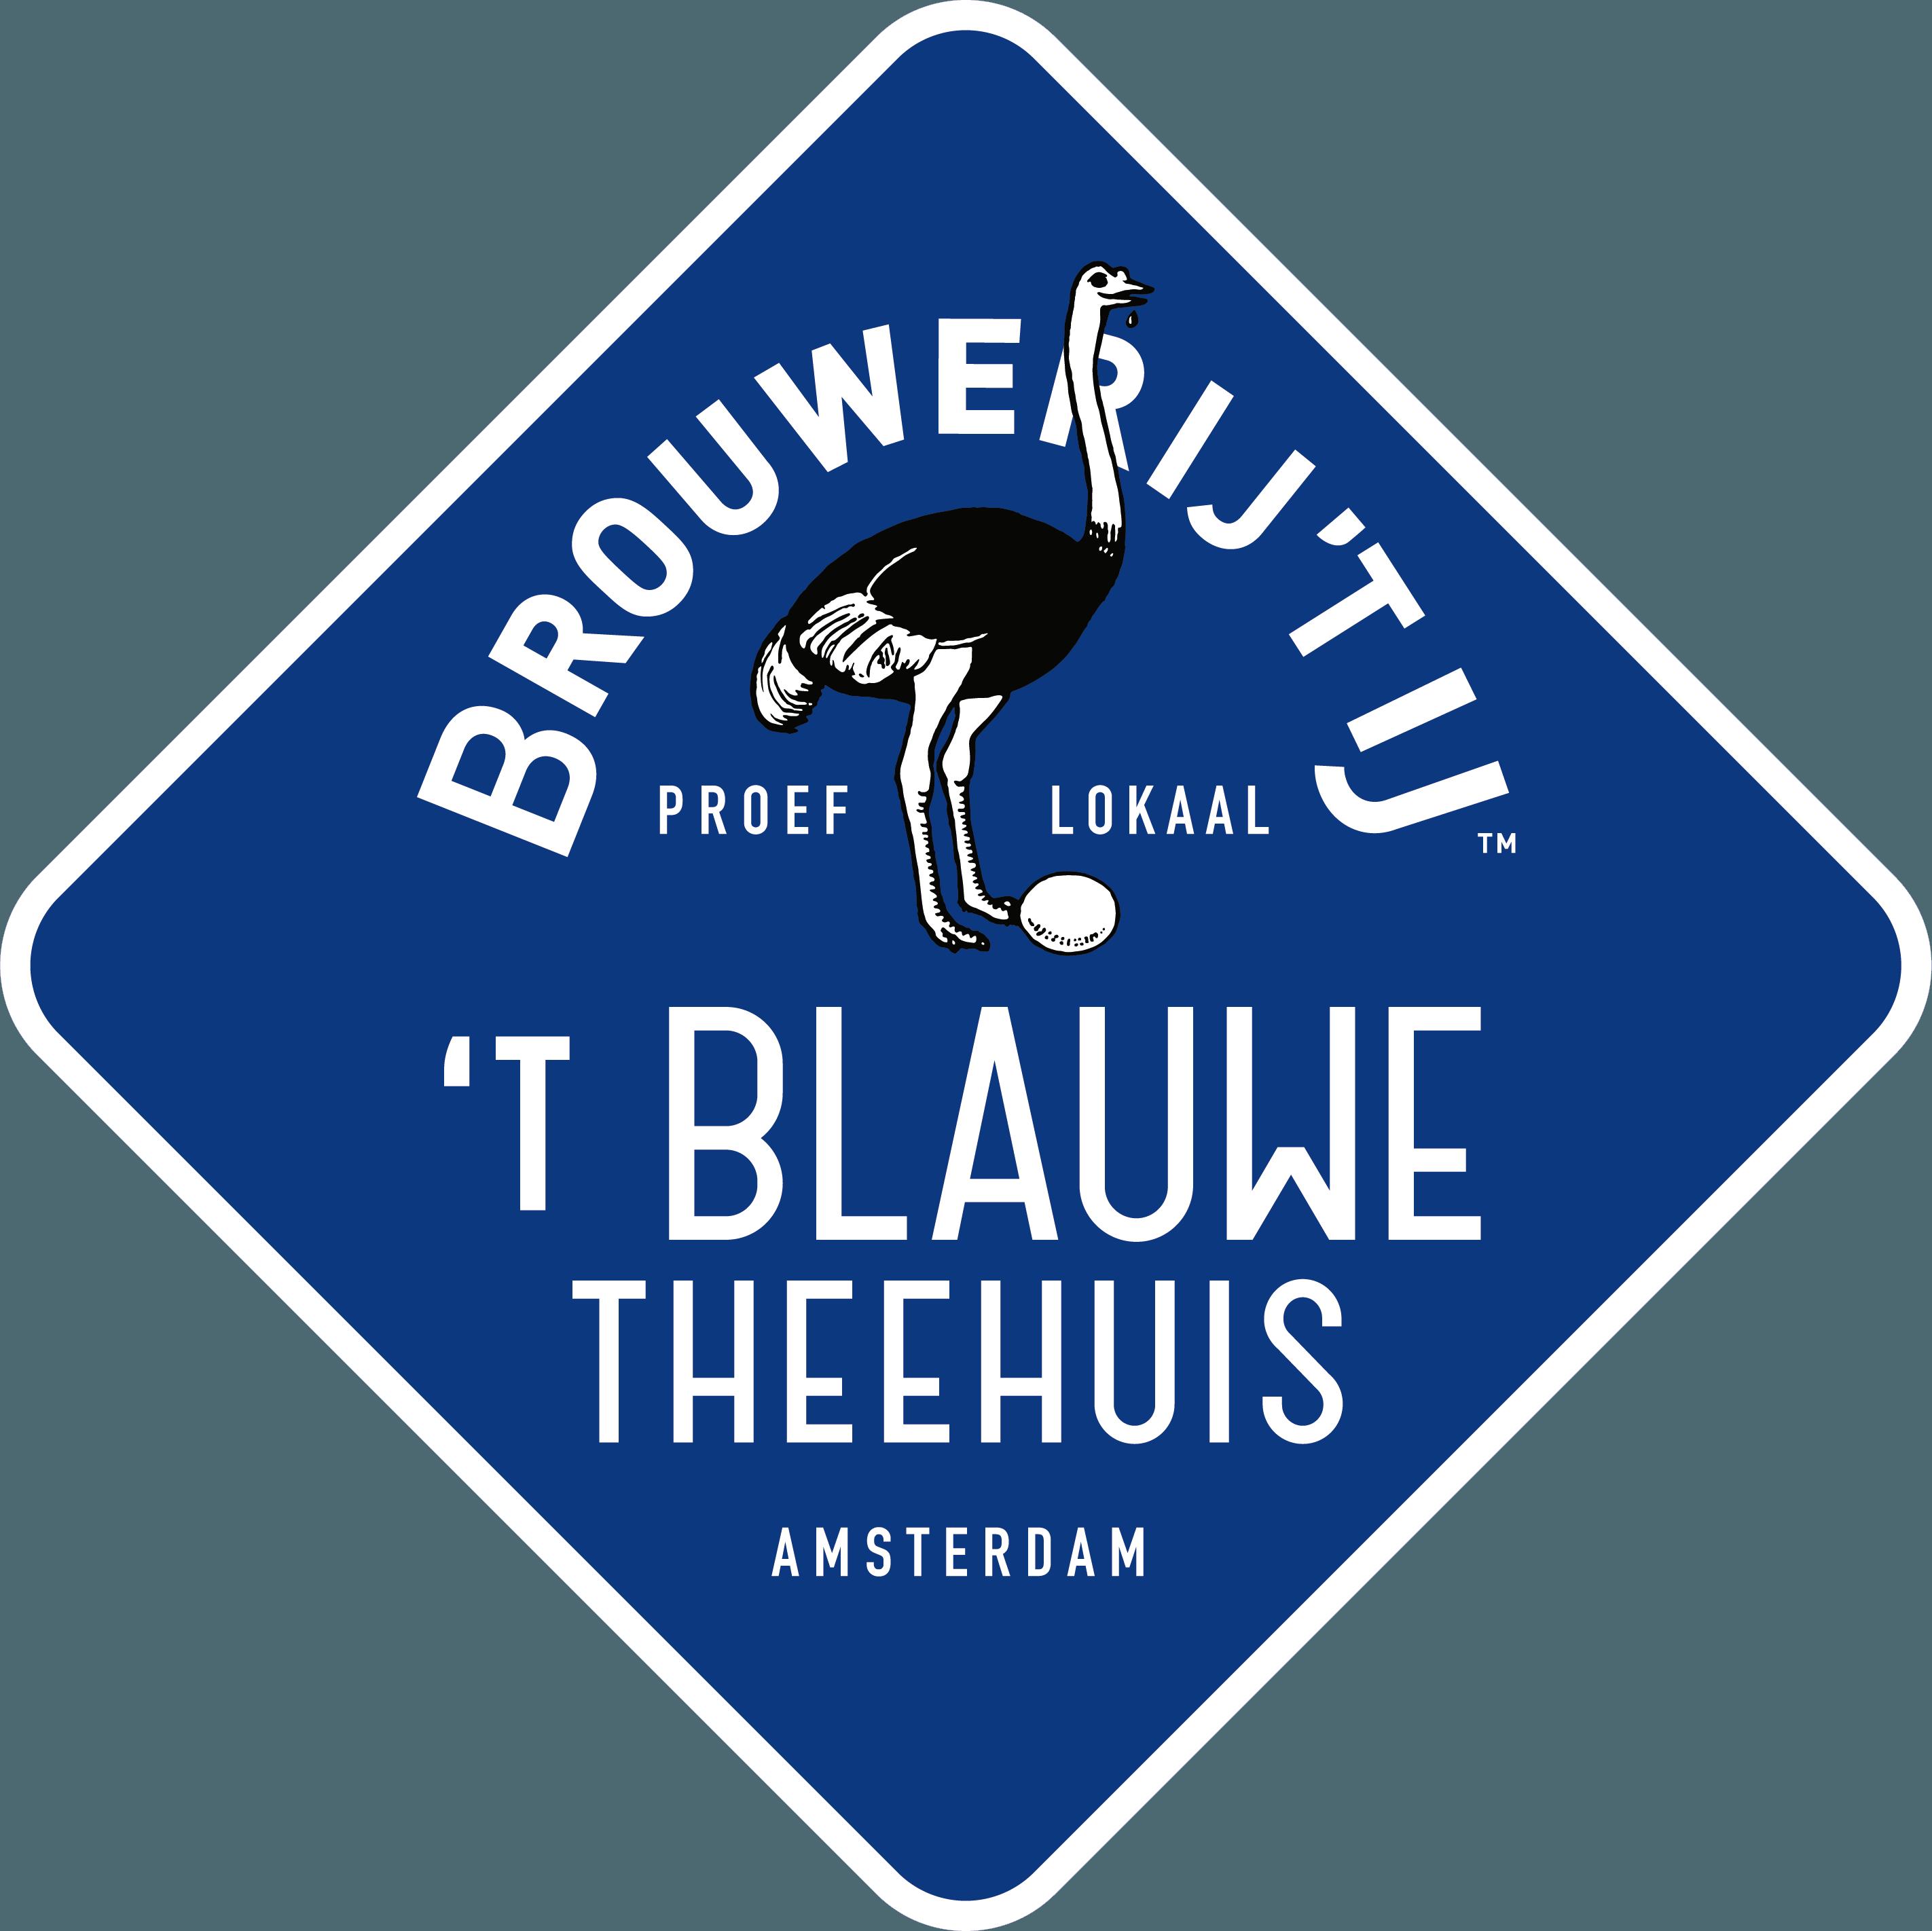 't Blauwe Theehuis